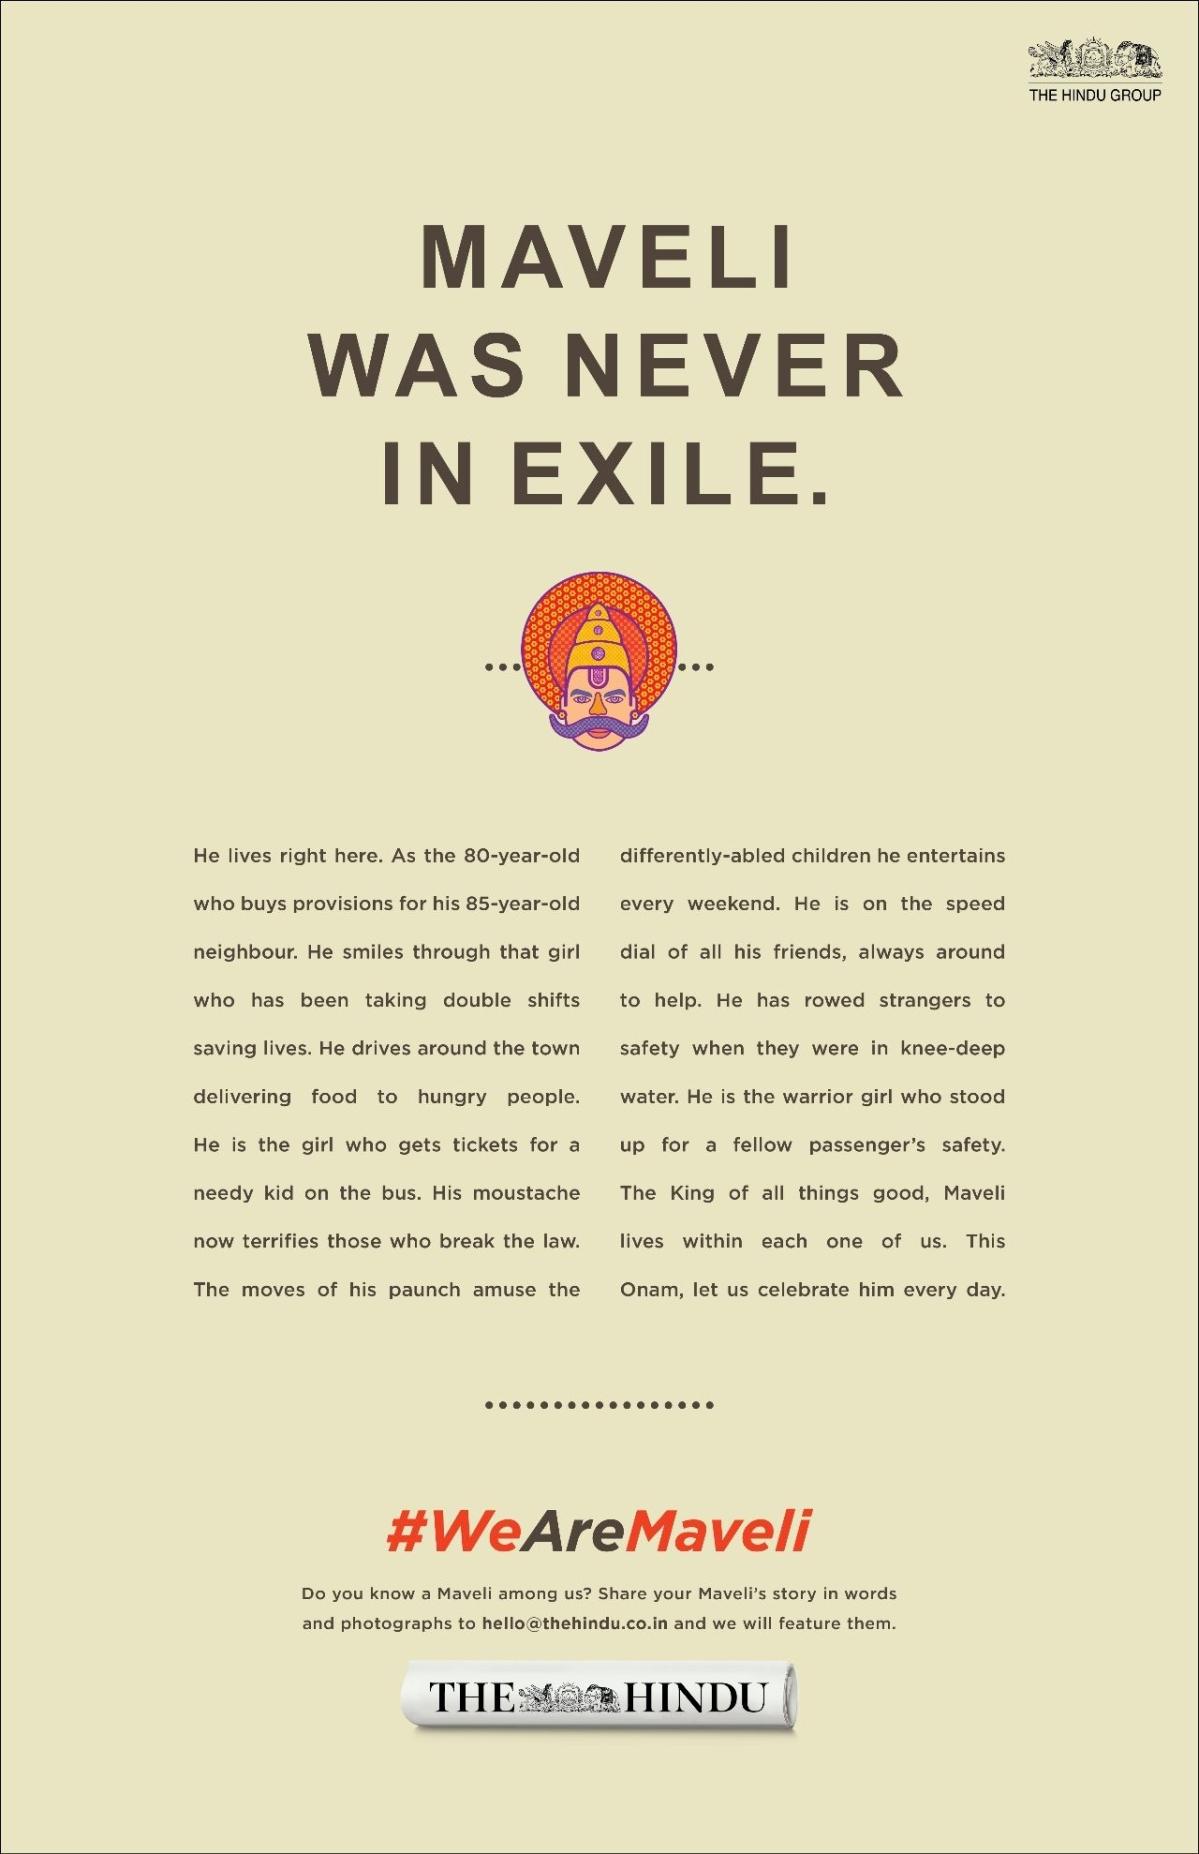 The Hindu celebrates Maveli's noble deeds in Onam ad